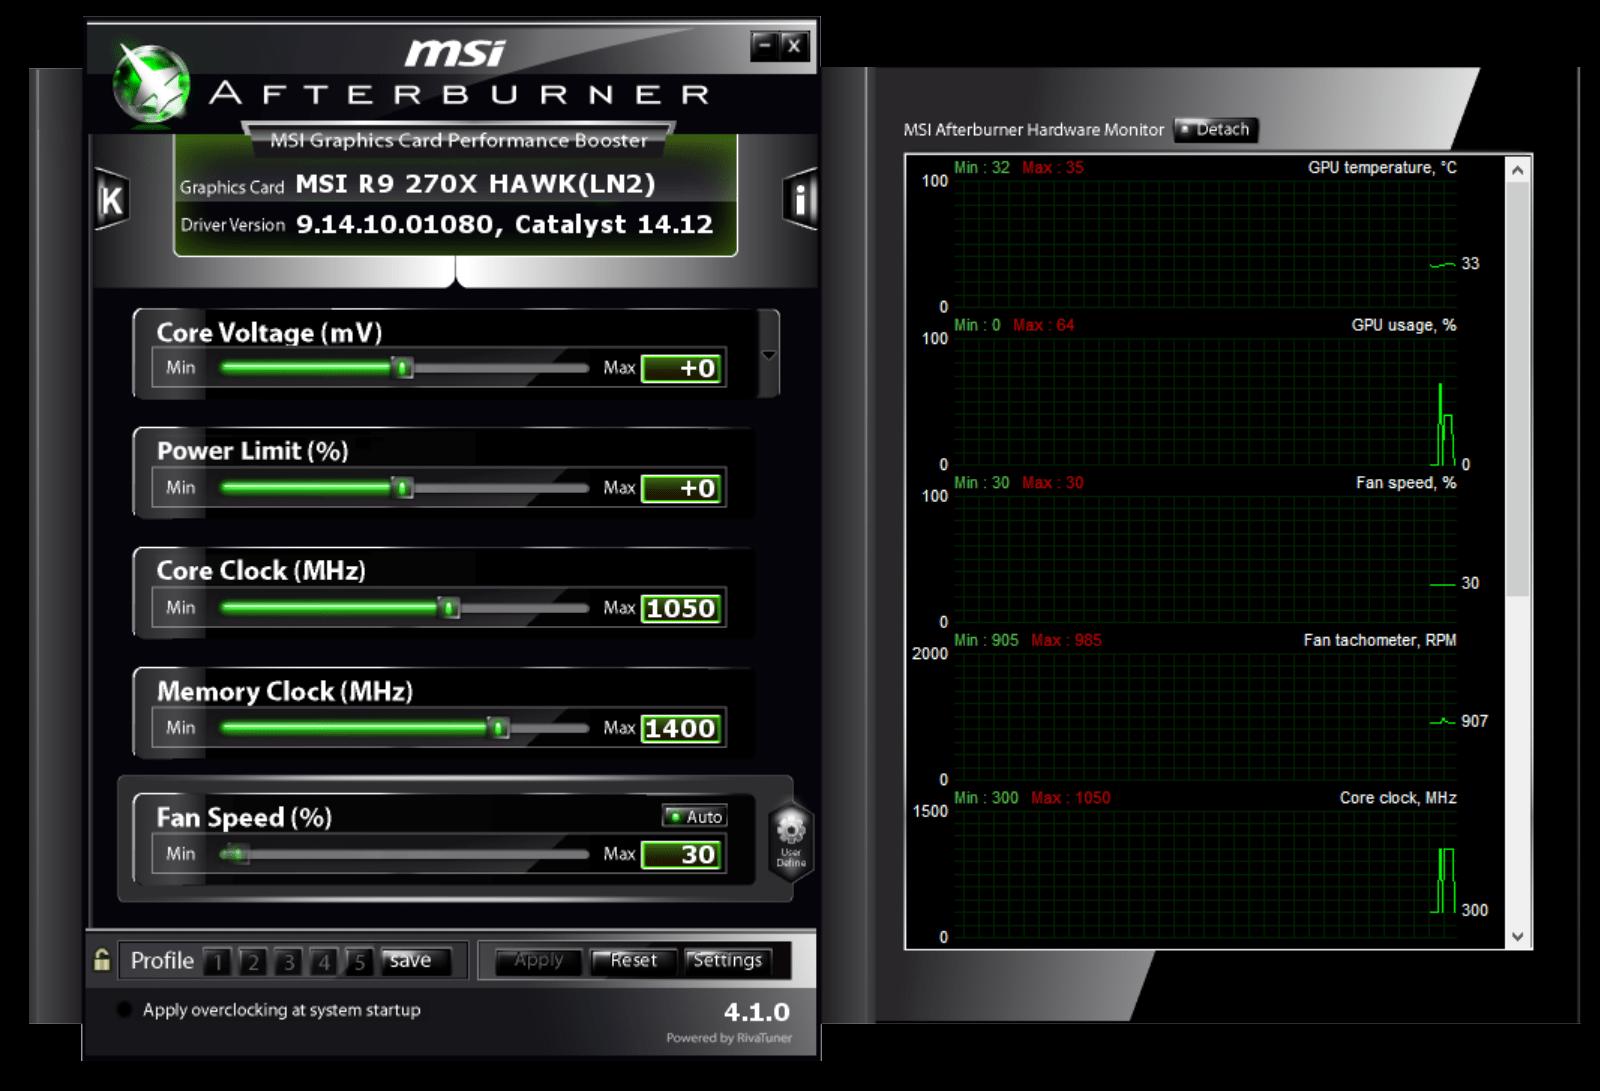 msi afterburner interface